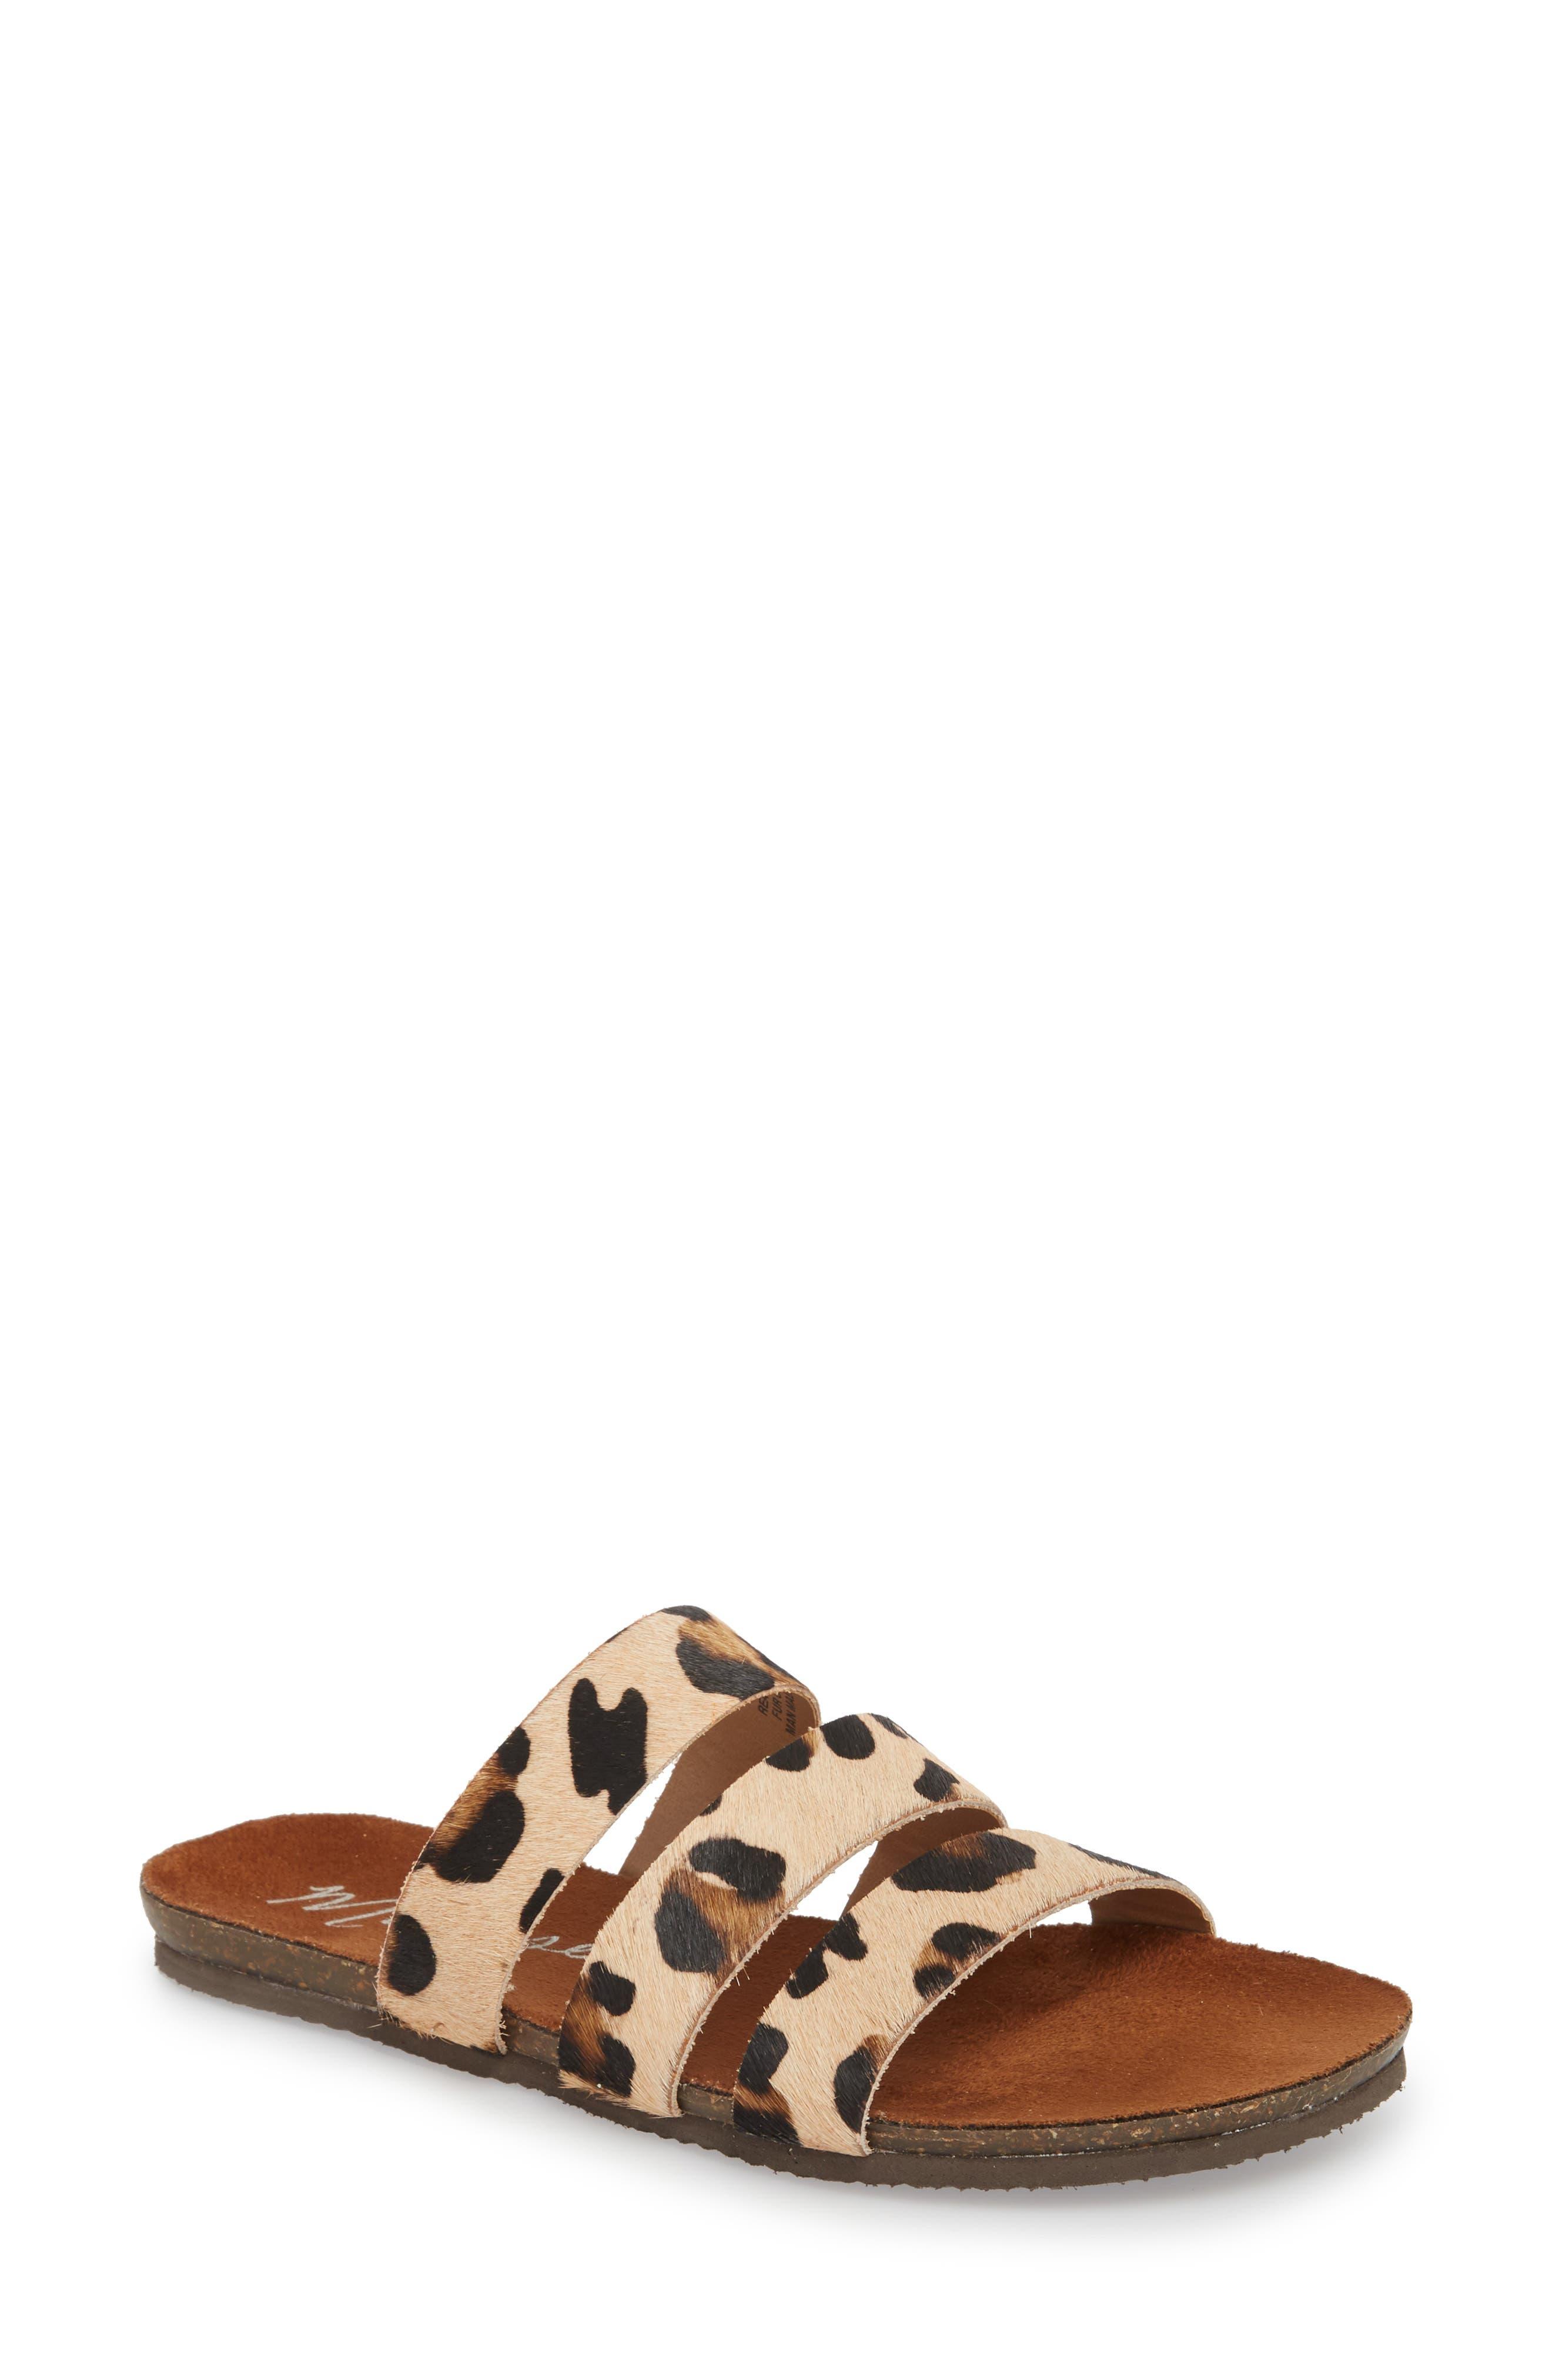 Florence Slide Sandal,                             Main thumbnail 1, color,                             Leopard Calf Hair